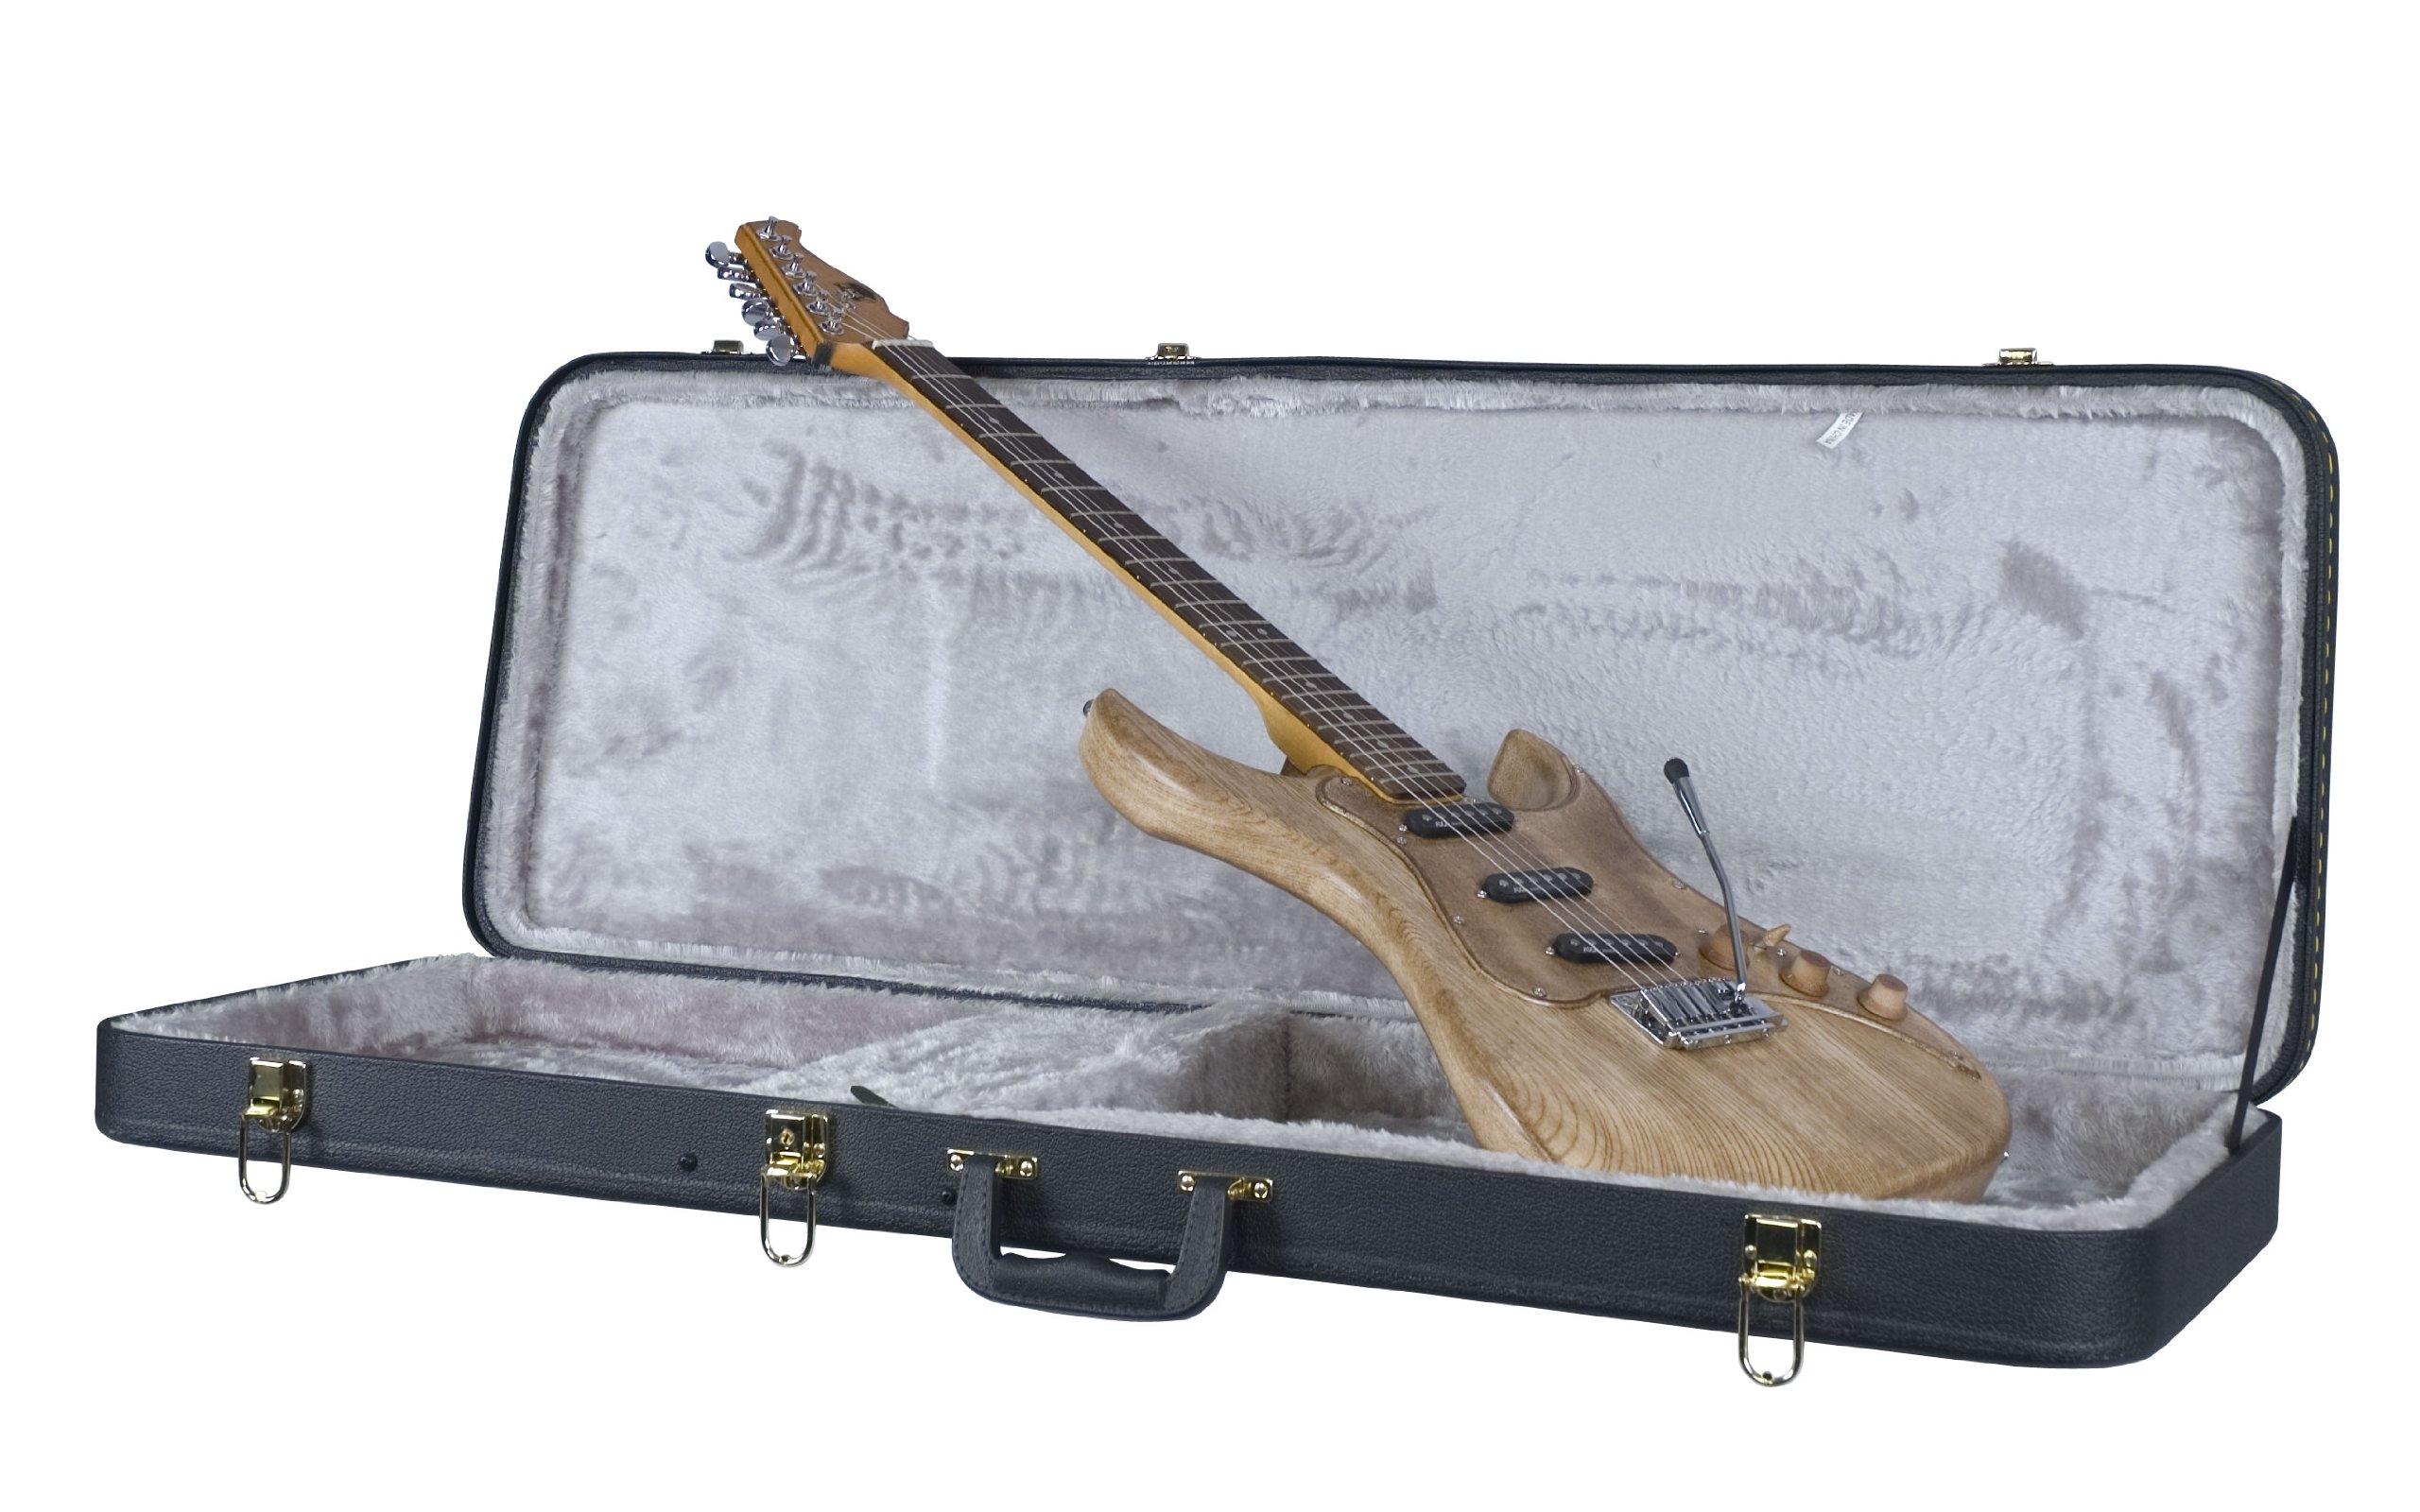 Cheap Guardian CG-018-E Hardshell Case Electric Guitar Black Friday & Cyber Monday 2019